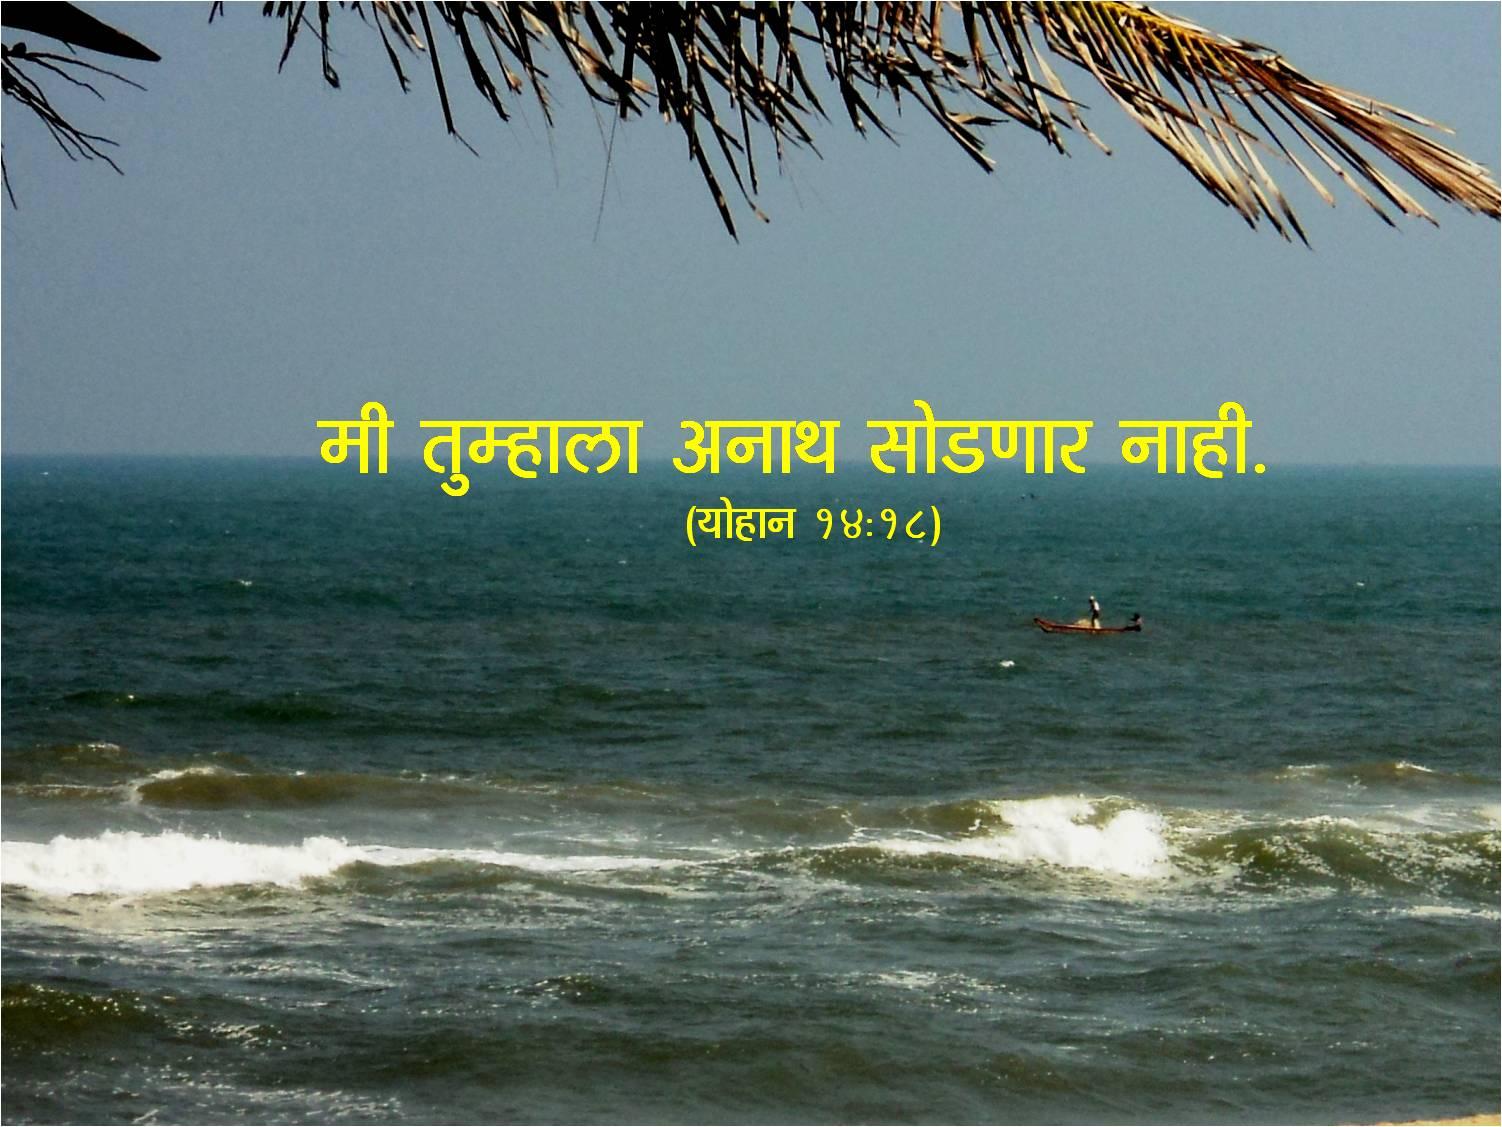 marathi bible wallpaper for - photo #20